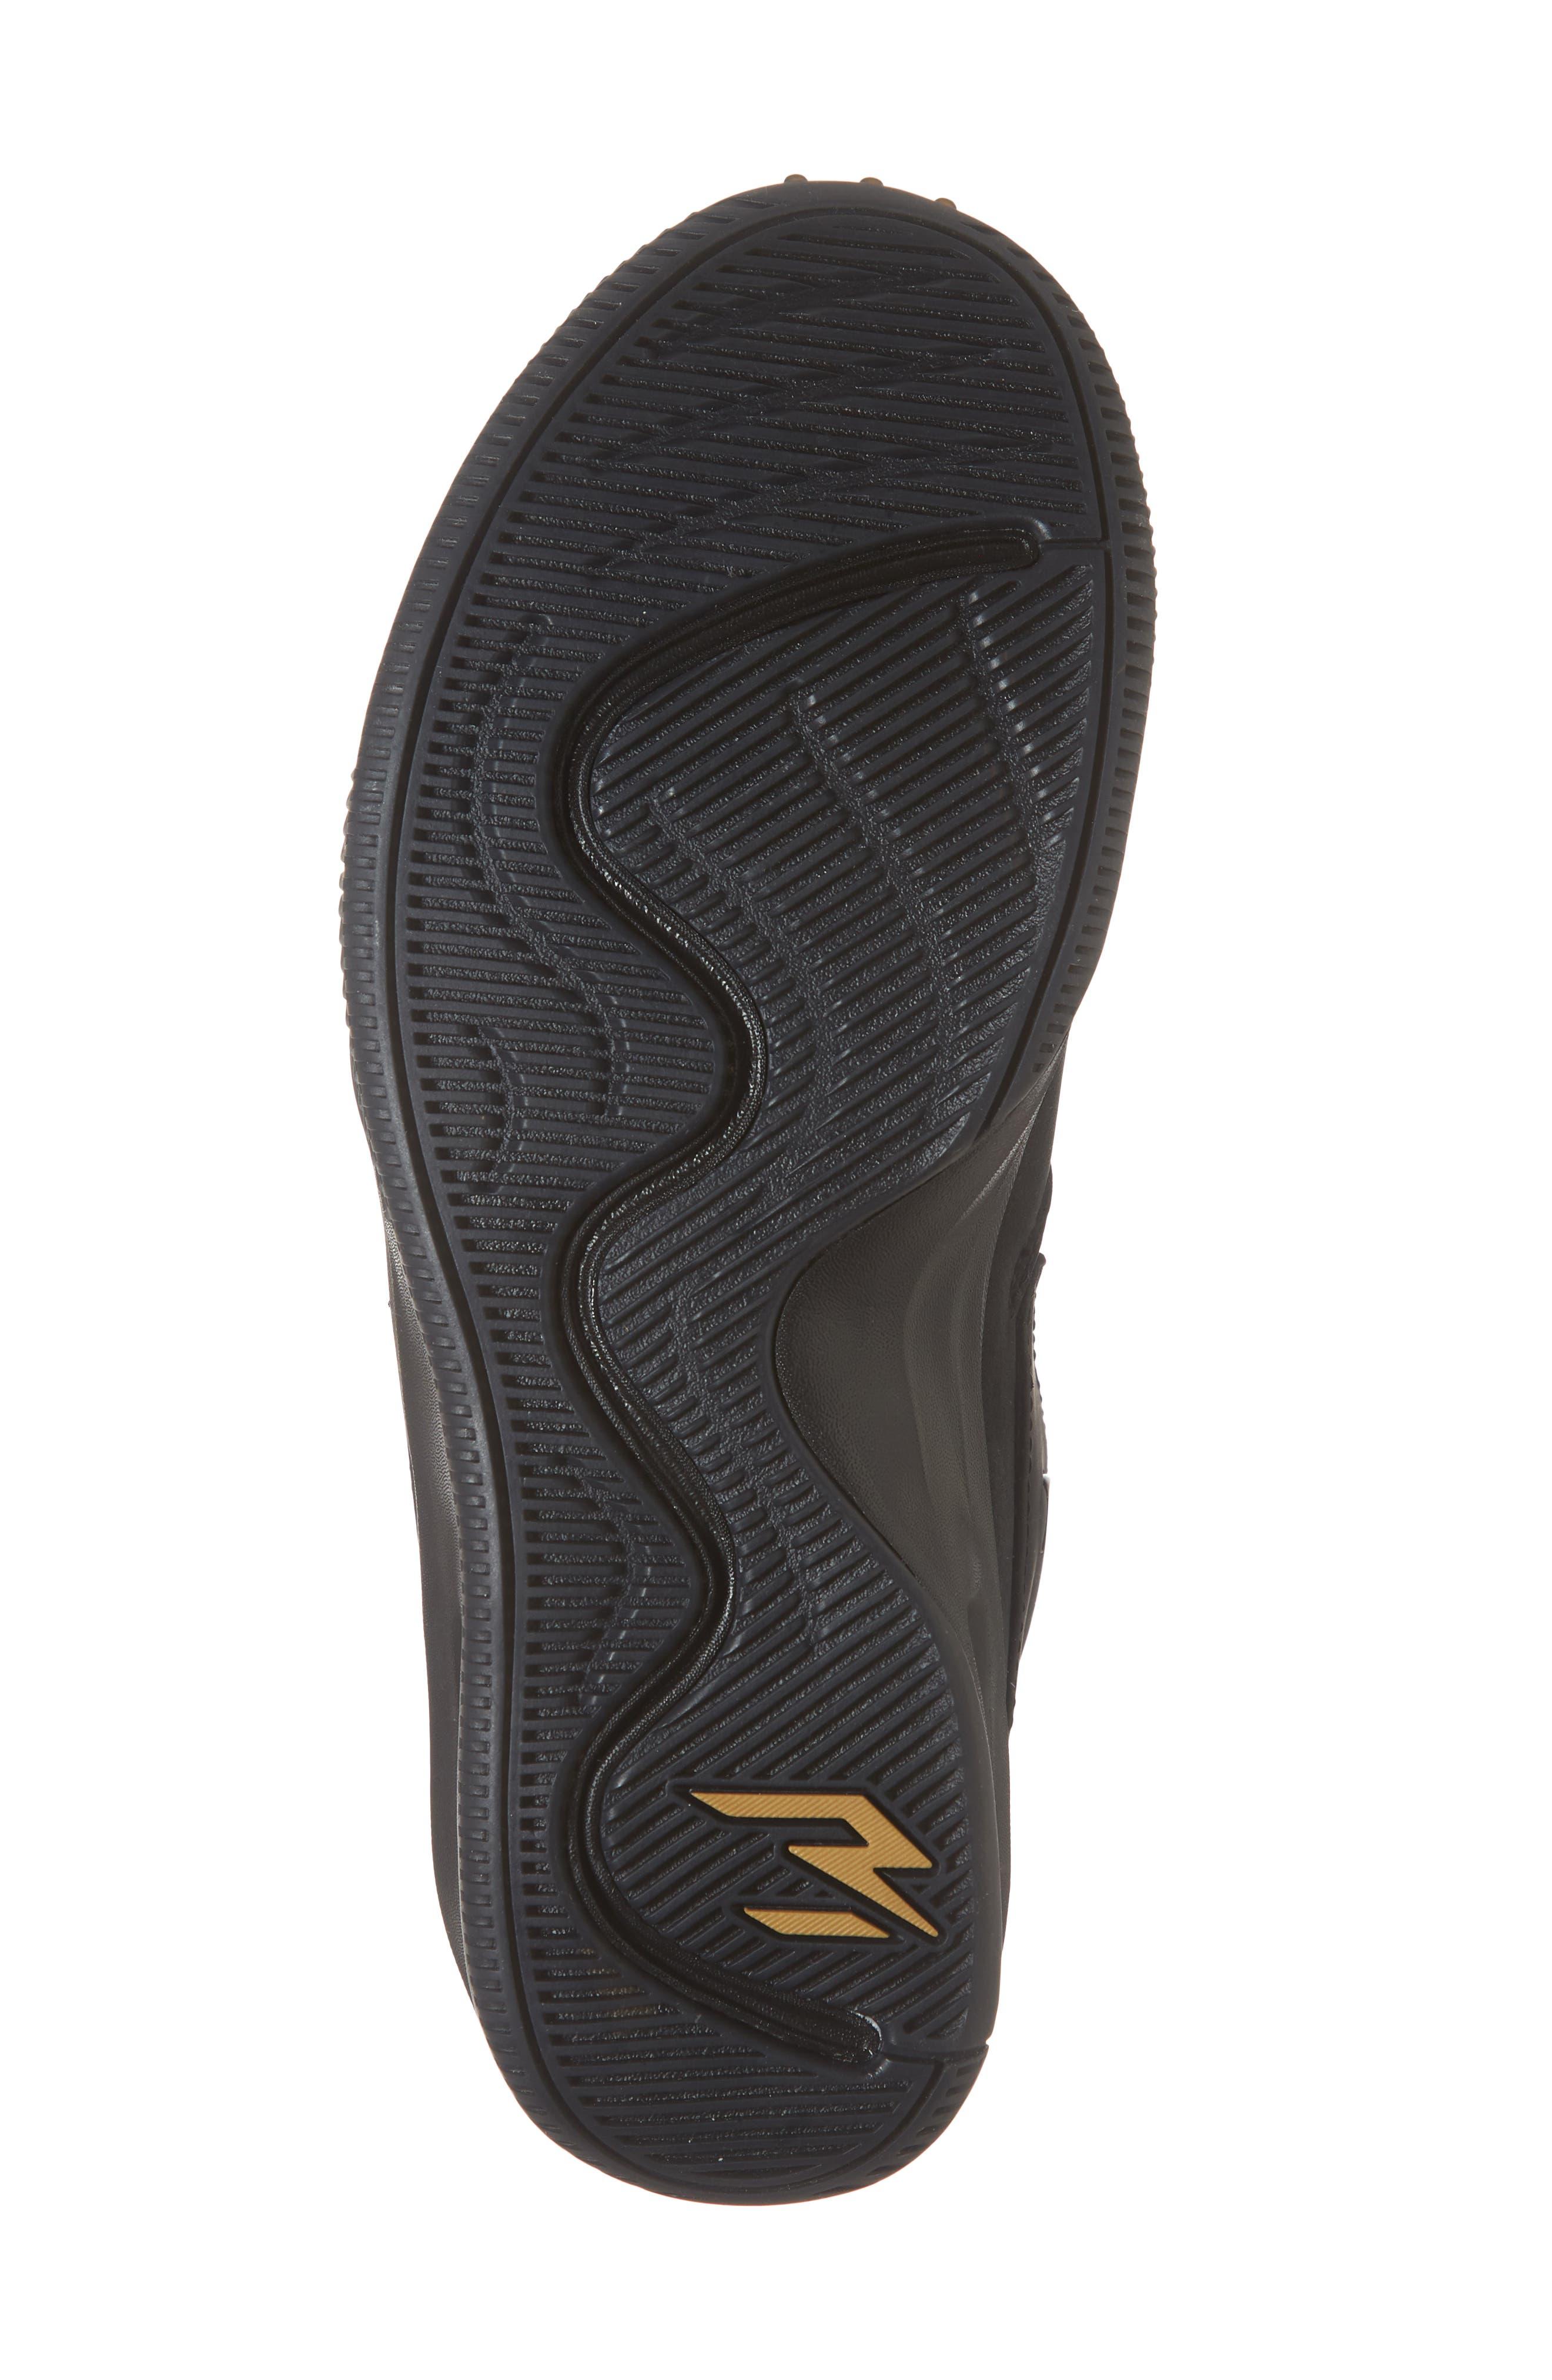 Dangeruss Wilson 1 Sneaker,                             Alternate thumbnail 6, color,                             BLACK/ METALLIC GOLD